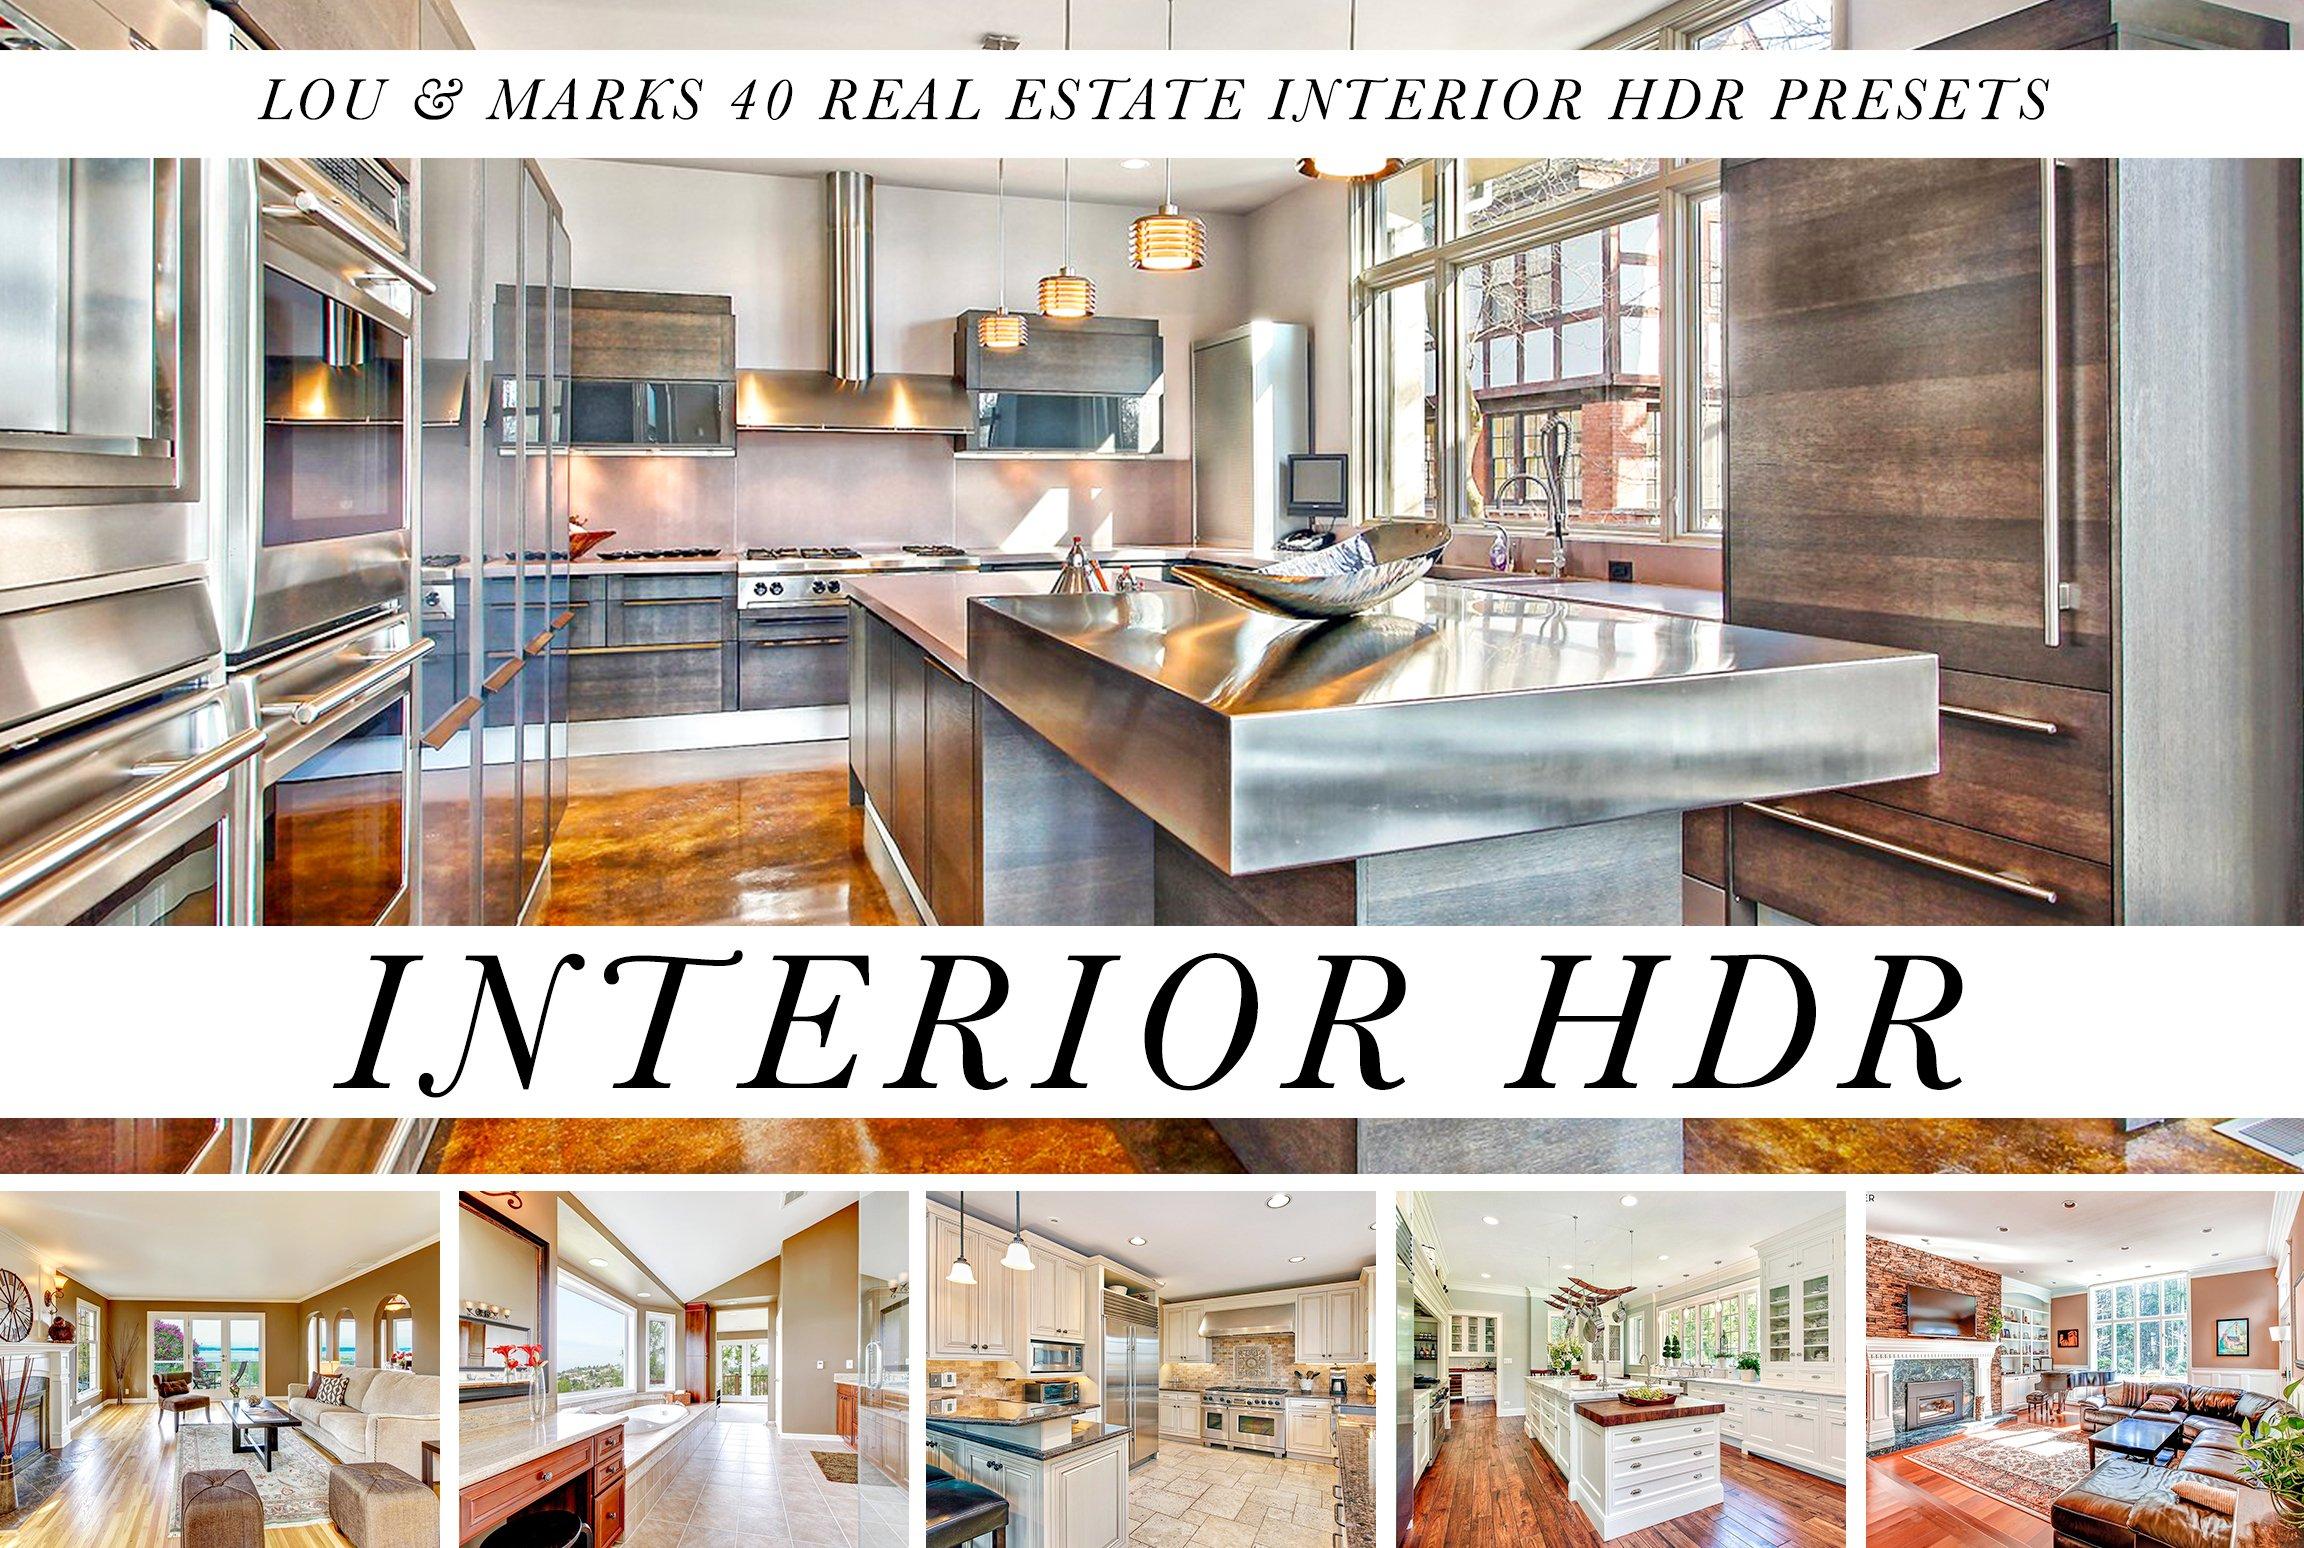 21 HDR Interior Real Estate Presets   Unique Lightroom Presets ...